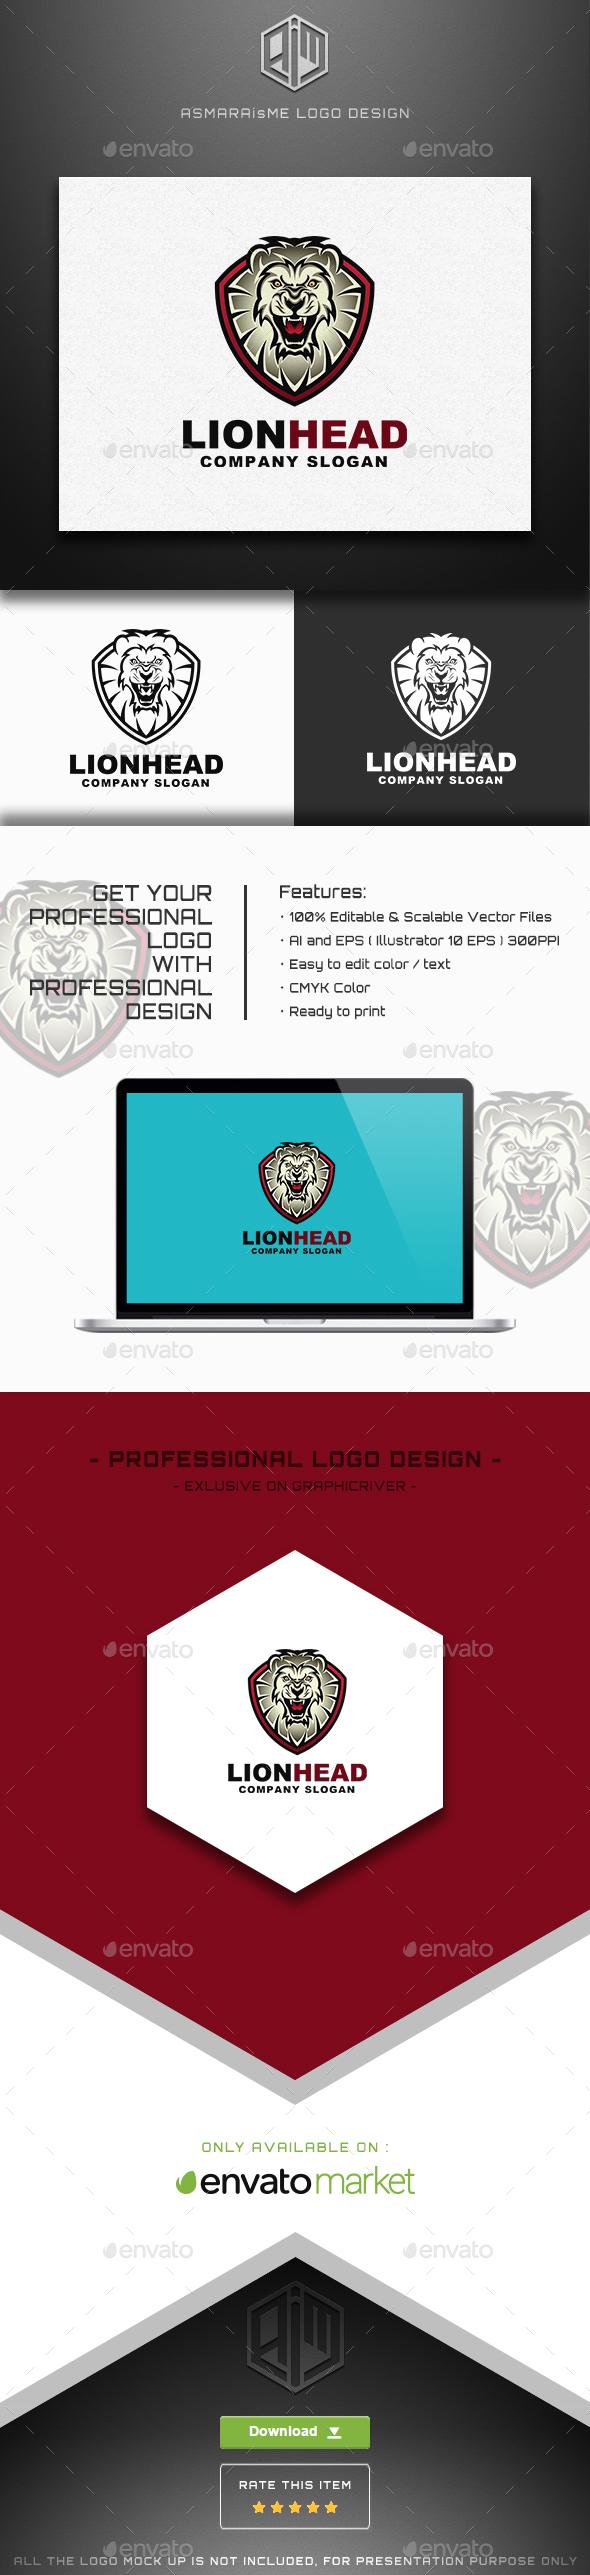 Lion Head / Lion Shield Logo